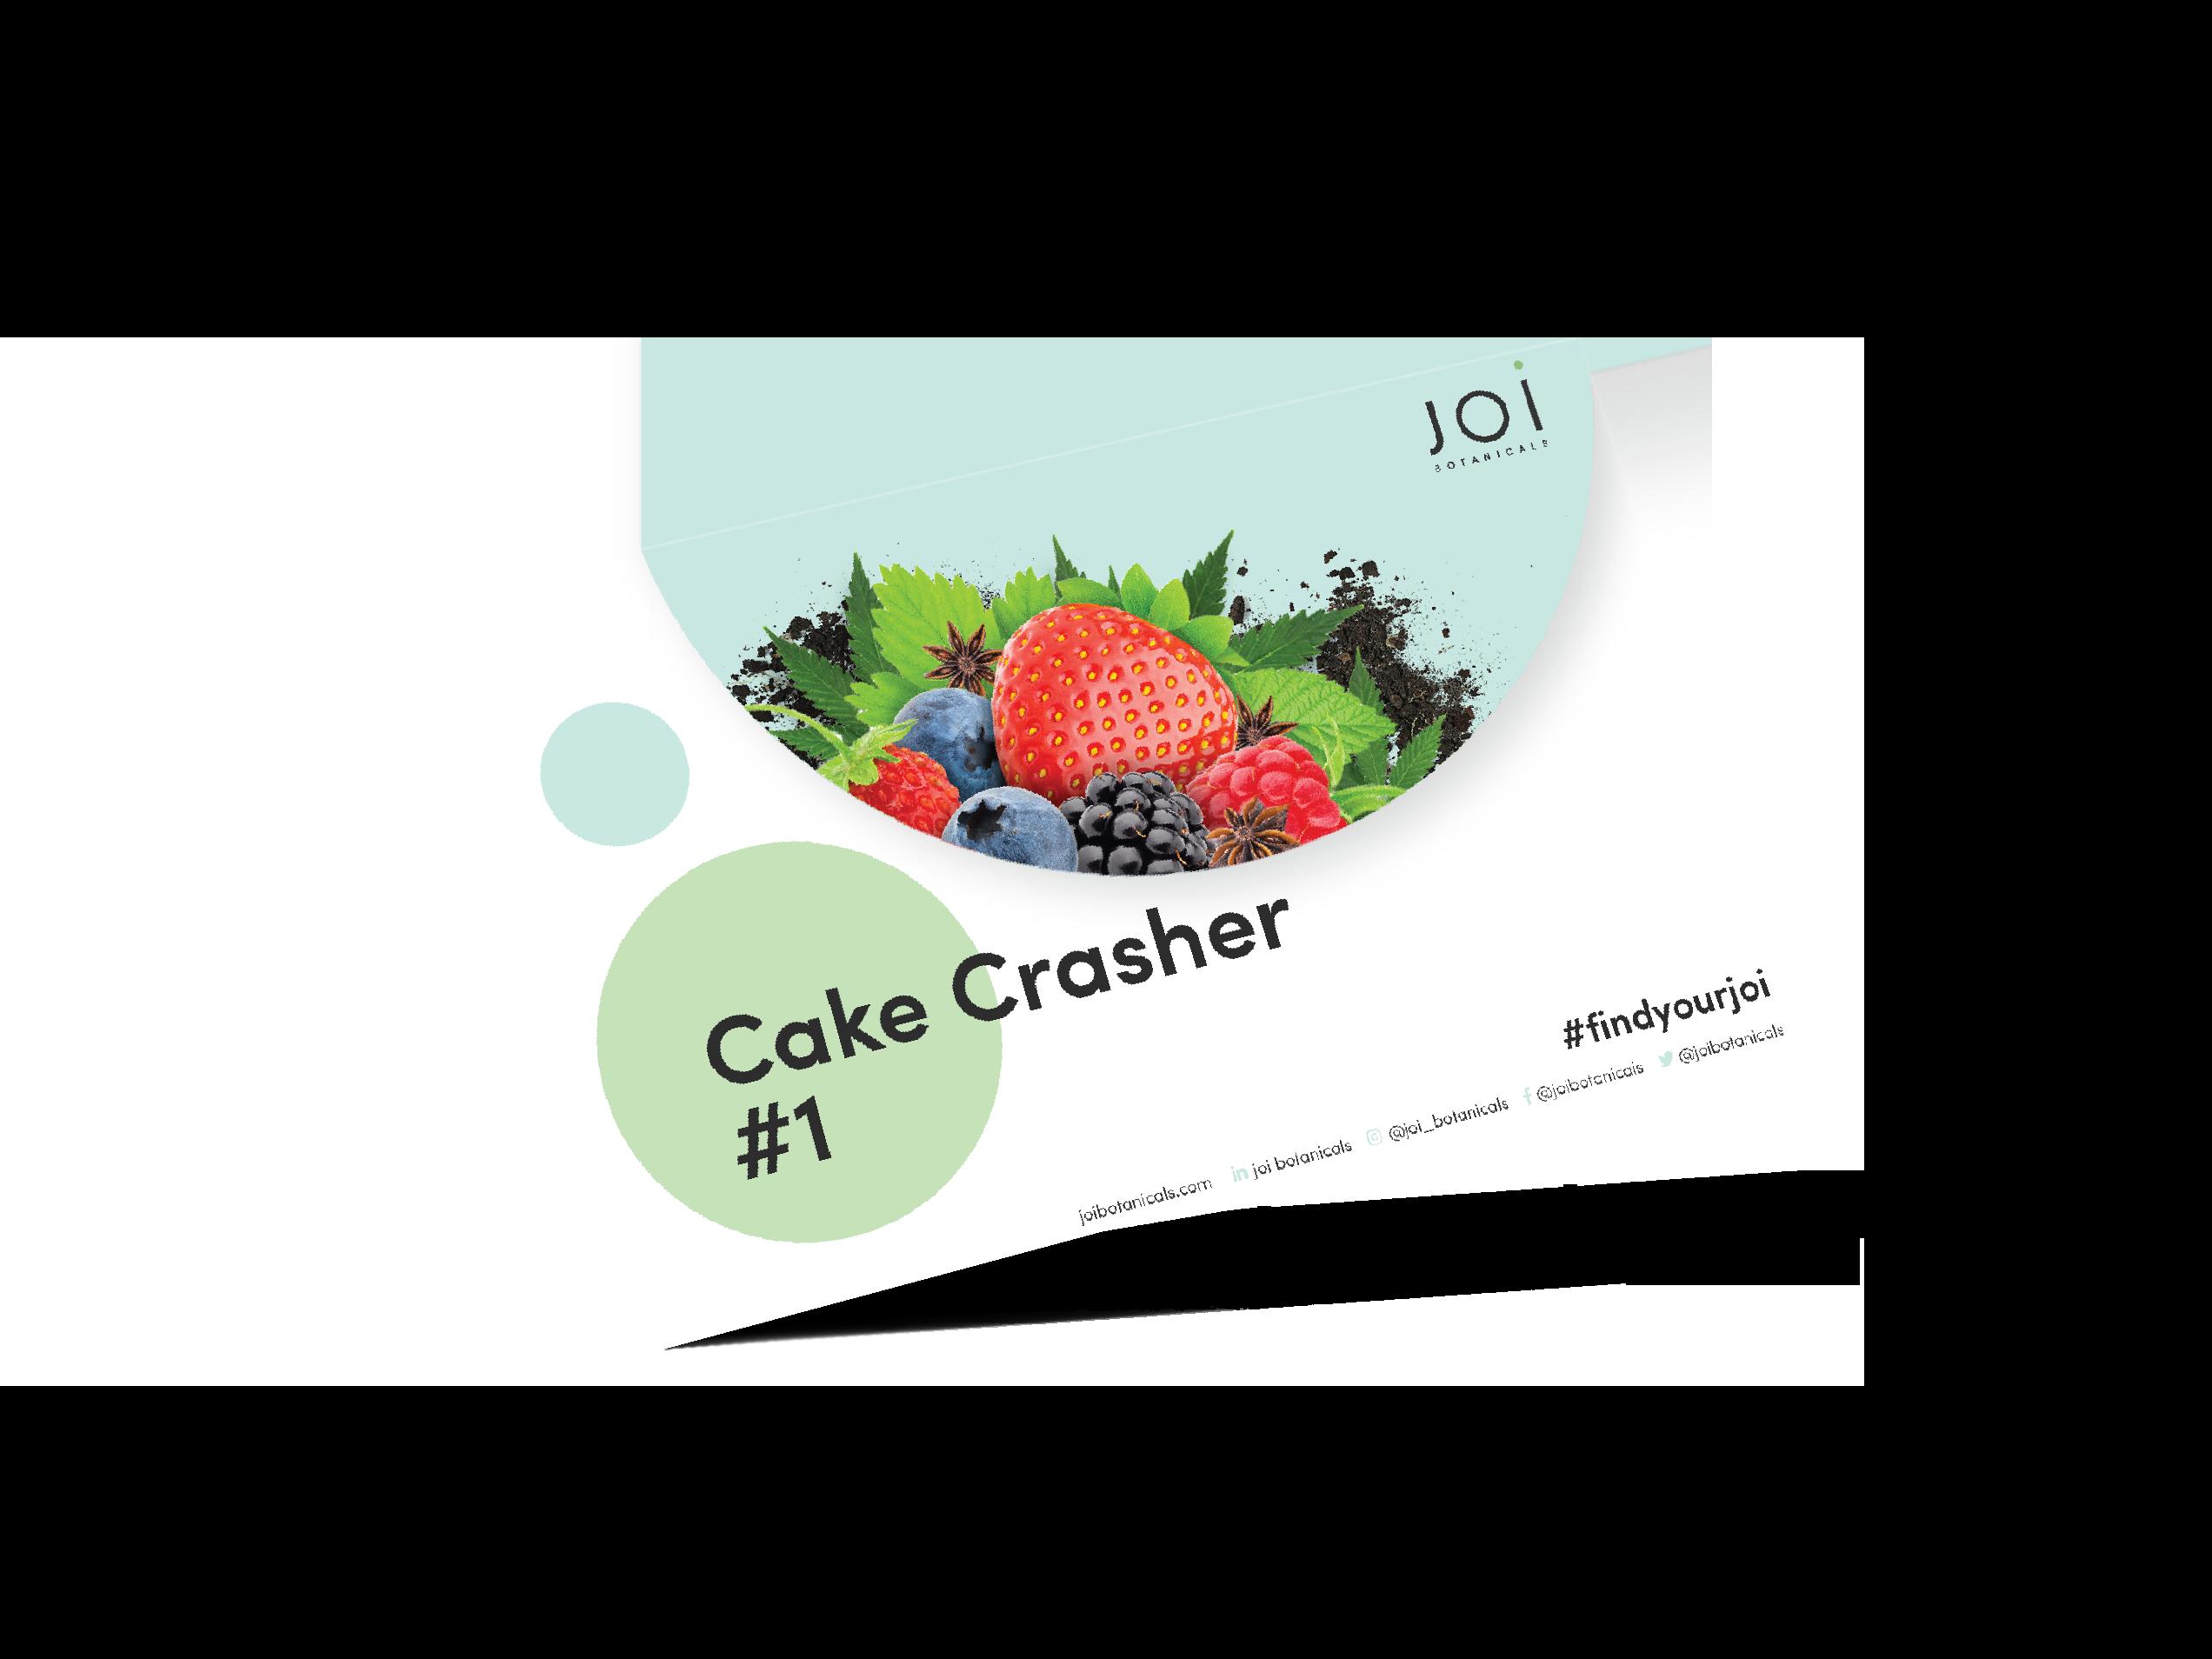 Cake Crasher #1